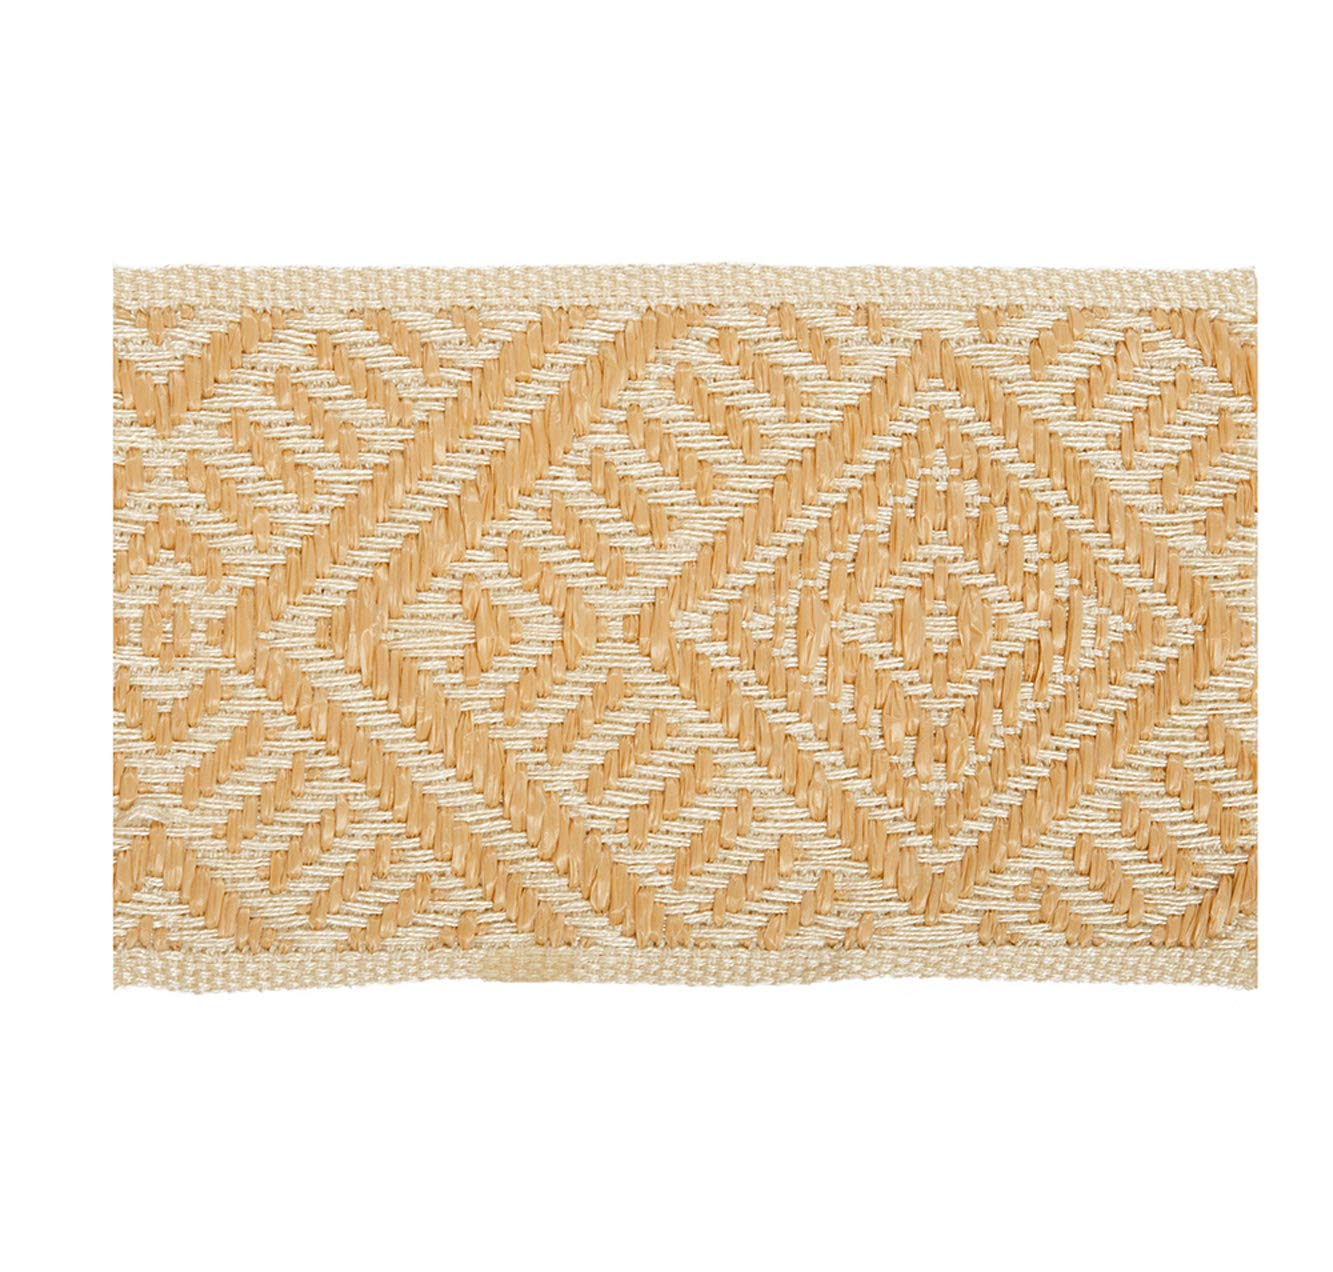 Kravet Design Bistro Braid Sandstone T30609 16 by Fabric & Fabric